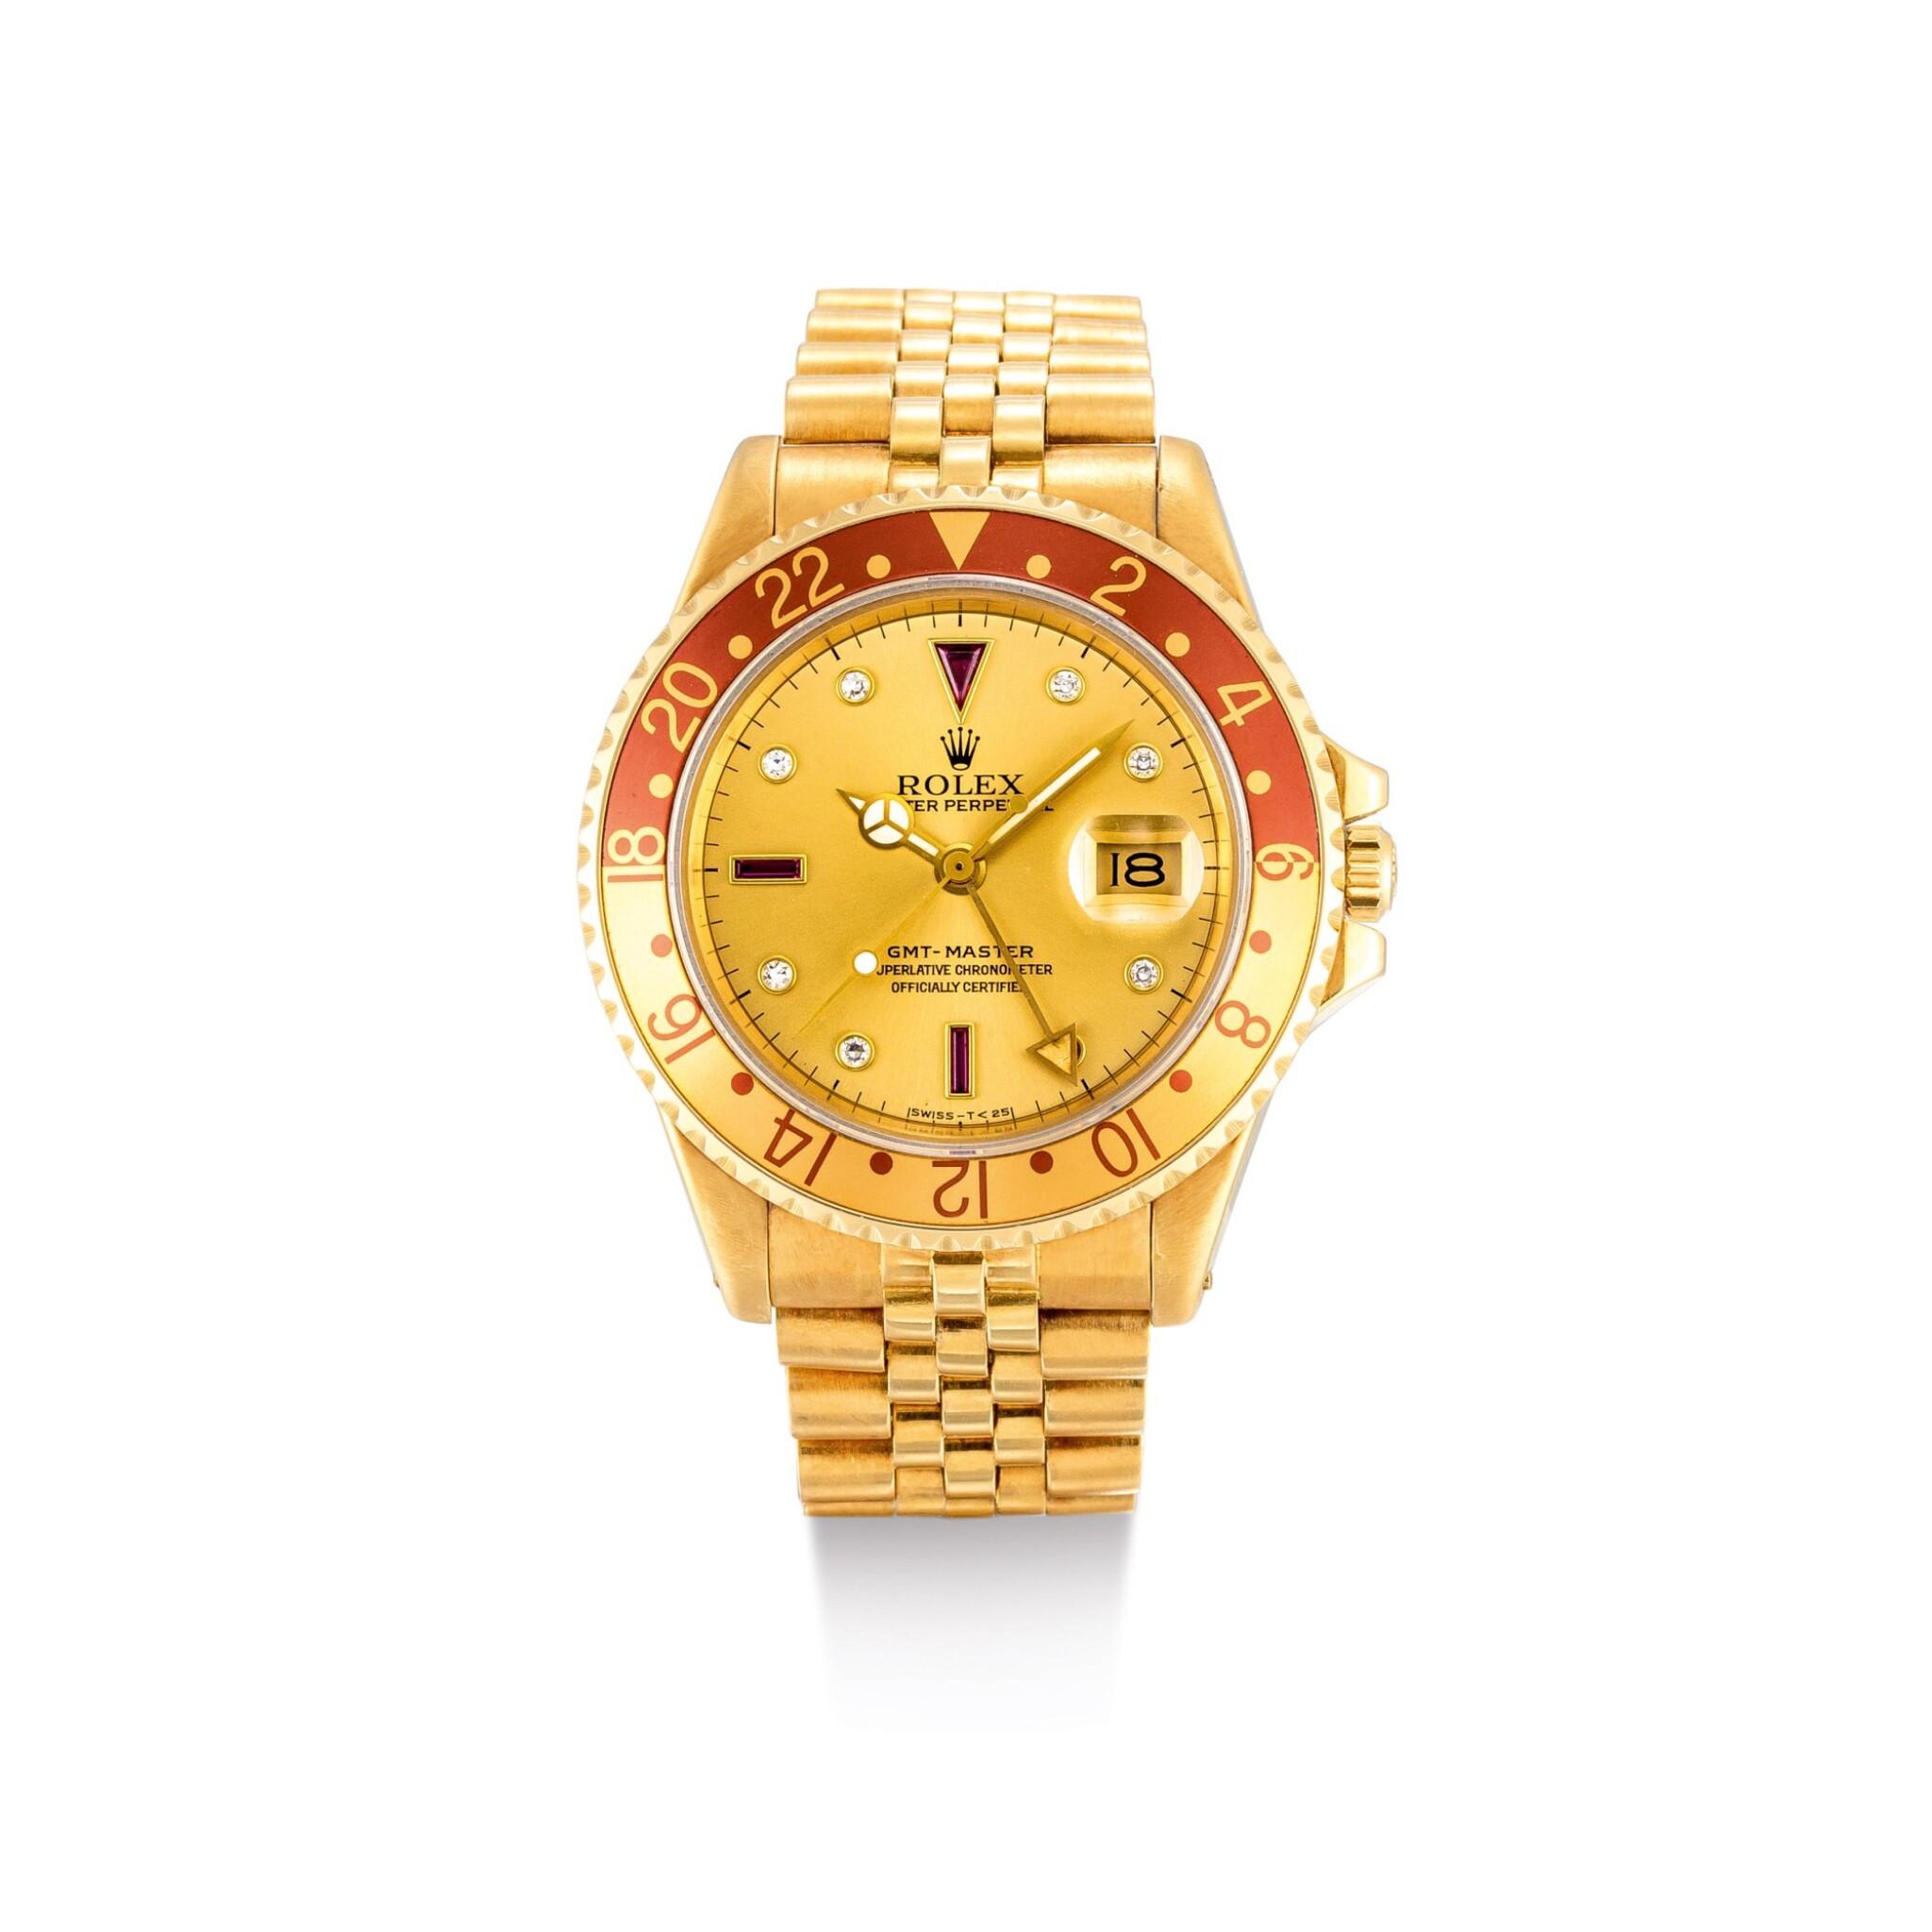 "View 1 of Lot 2018. ROLEX | GMT-MASTER, REFERENCE 16758, A YELLOW GOLD, DIAMOND AND RUBY-SET DUAL TIME ZONE WRISTWATCH WITH DATE AND BRACELET, CIRCA 1987 | 勞力士 | ""GMT-Master 型號16758 黃金鑲鑽石及紅寶石兩地時間鏈帶腕錶,備日期顯示,錶殼編號R288227,約1987年製""."